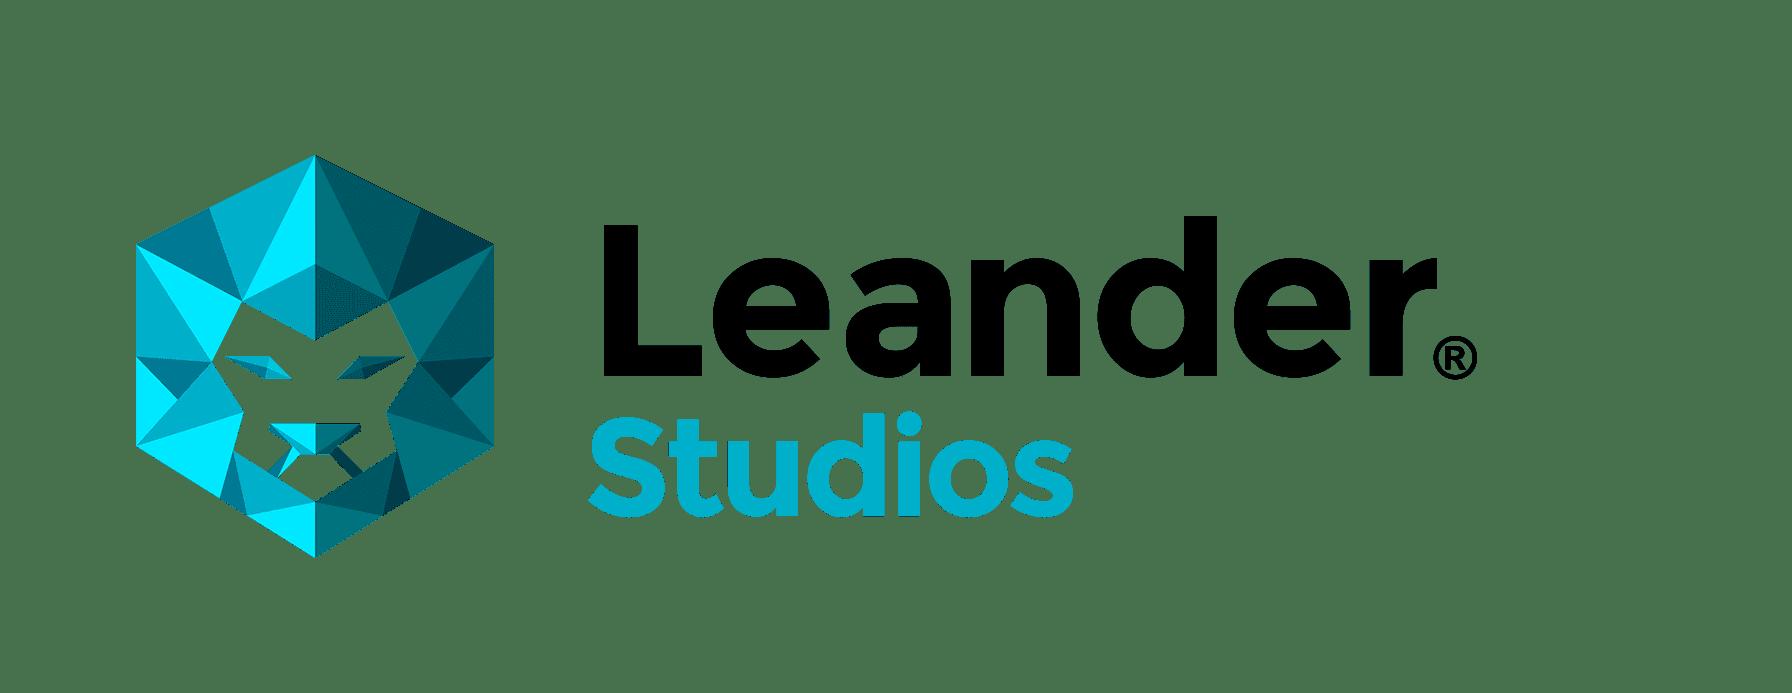 Leander Games best online casino software provider for Australians